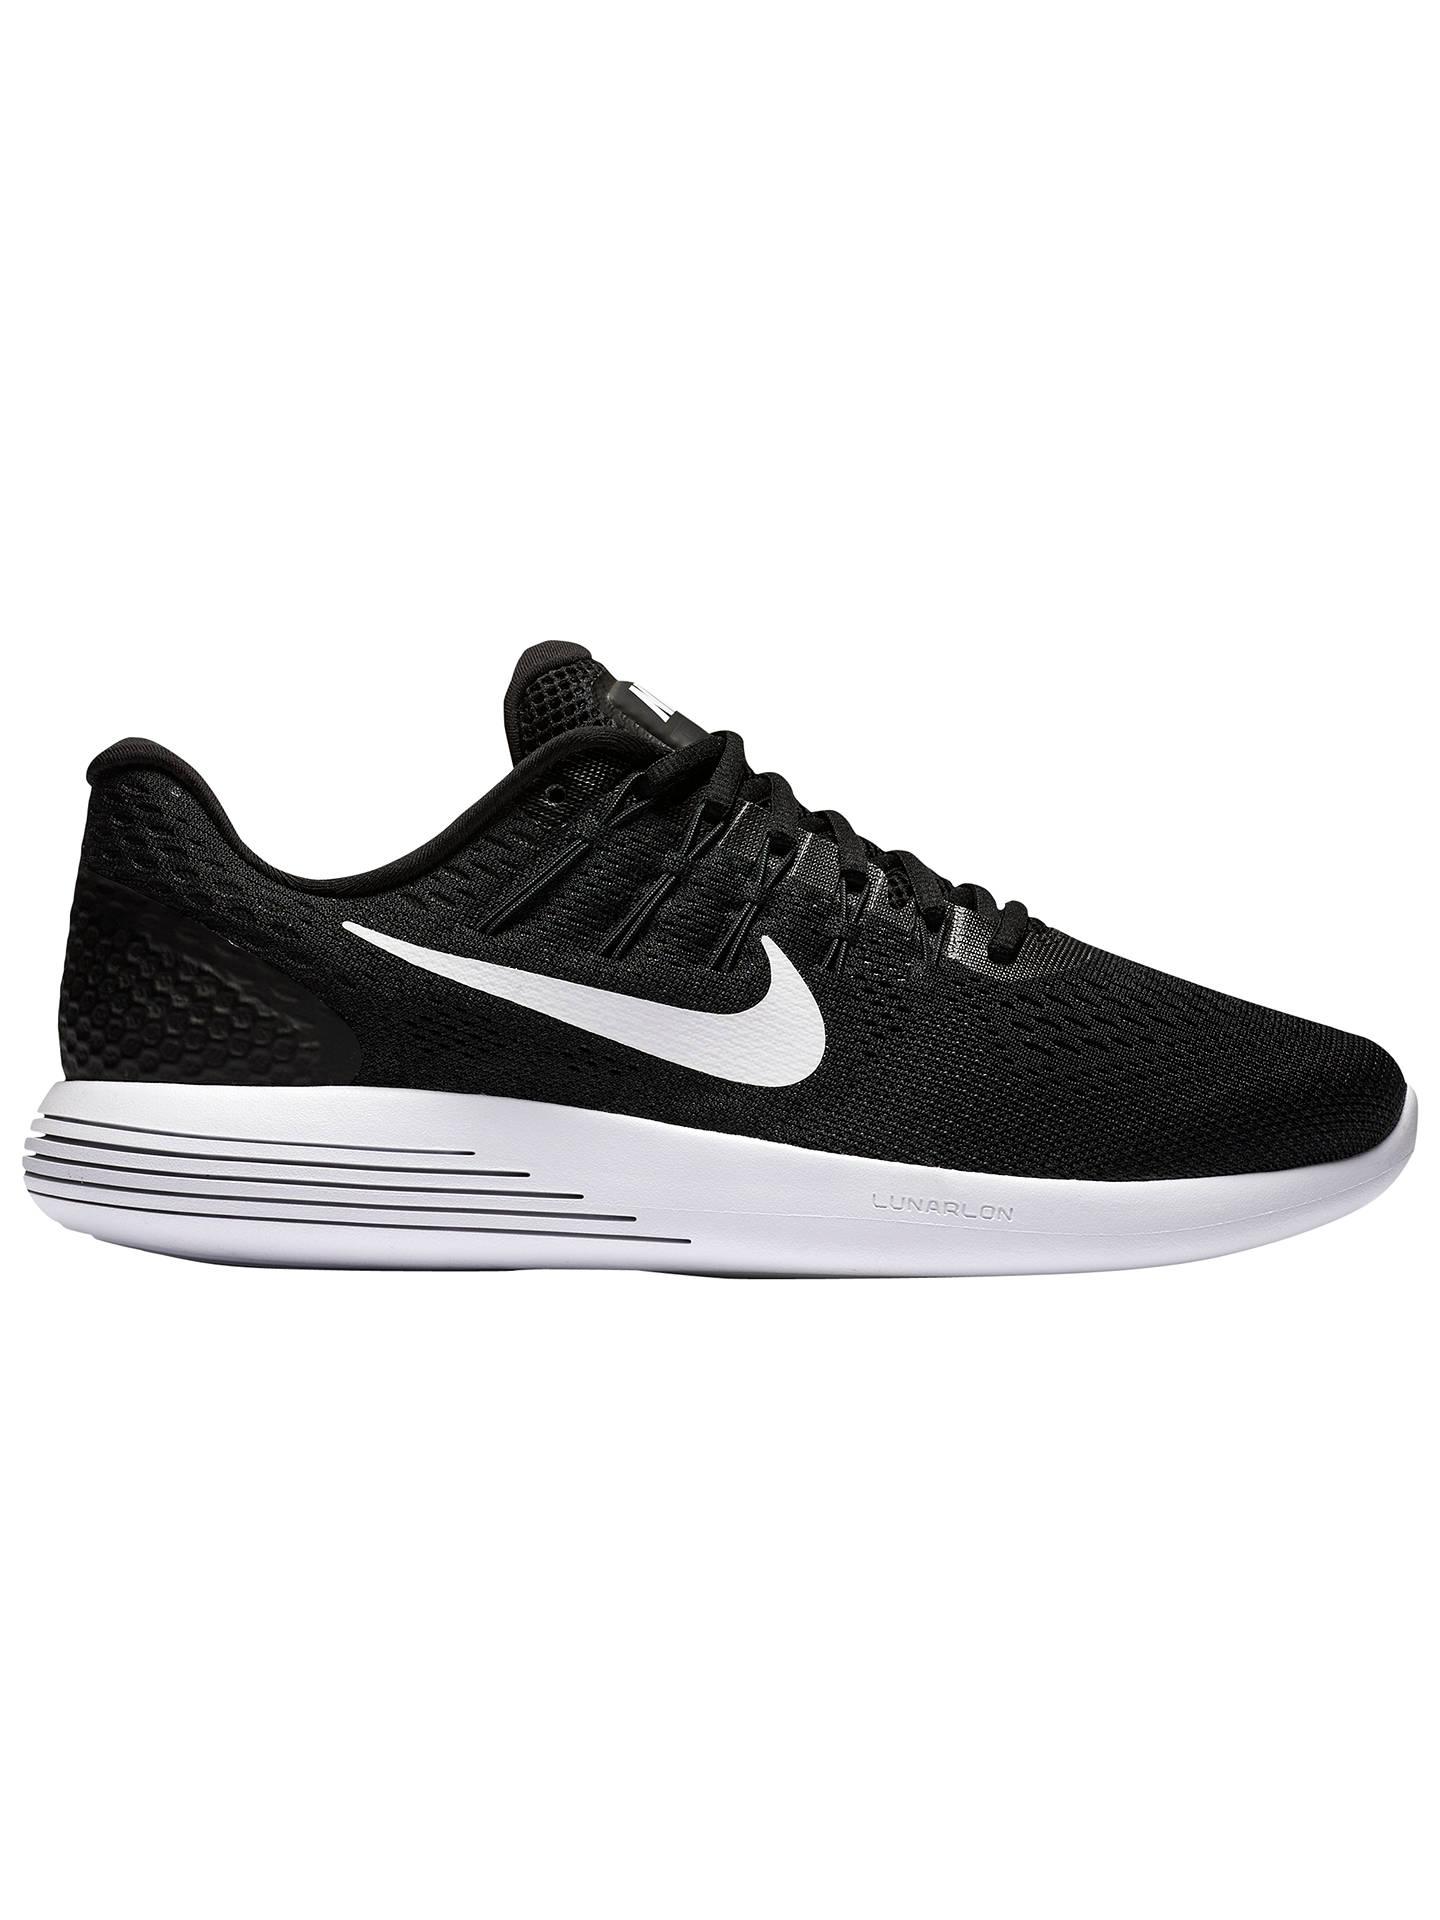 online retailer 7d13b a3b31 Nike LunarGlide 8 Men's Running Shoes at John Lewis & Partners